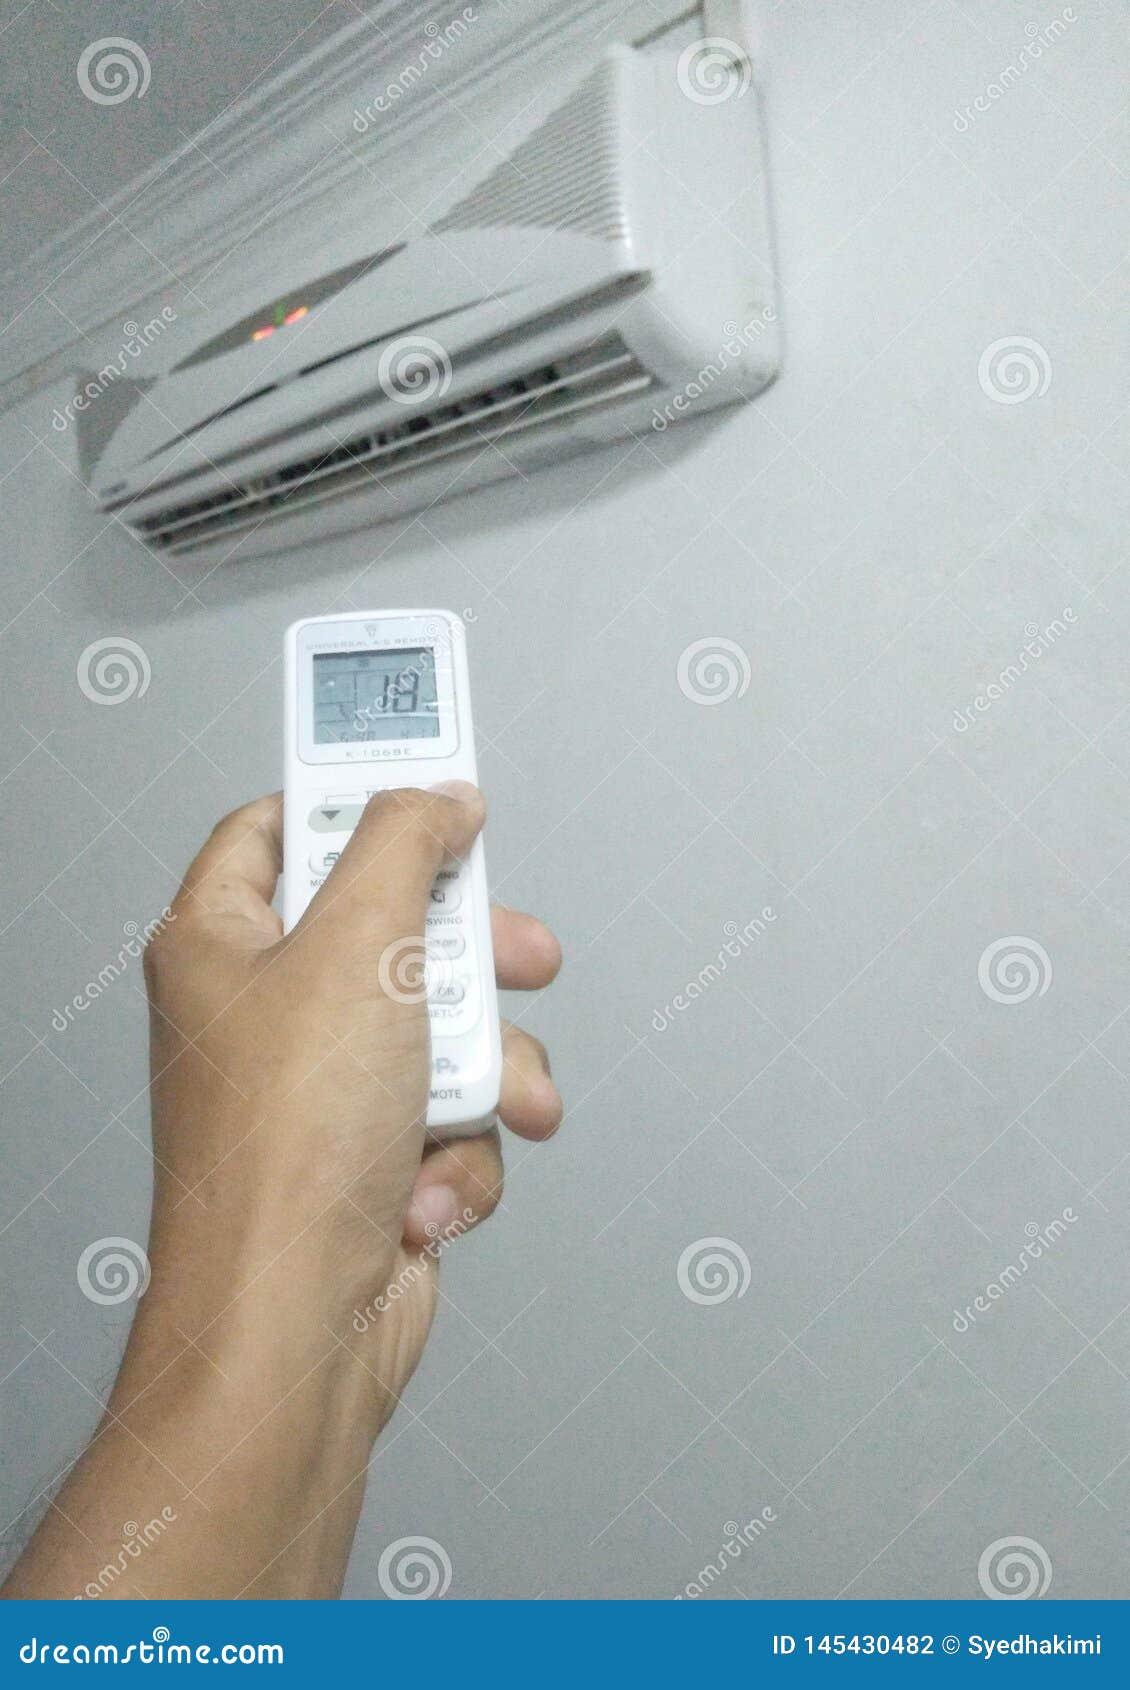 Bandar Seri Begawan/Brunei Darussalam - Maj 19 2019: Anv?nda universell fj?rrkontroll vid Chunghop f?r att ?ndra temperatur av lu